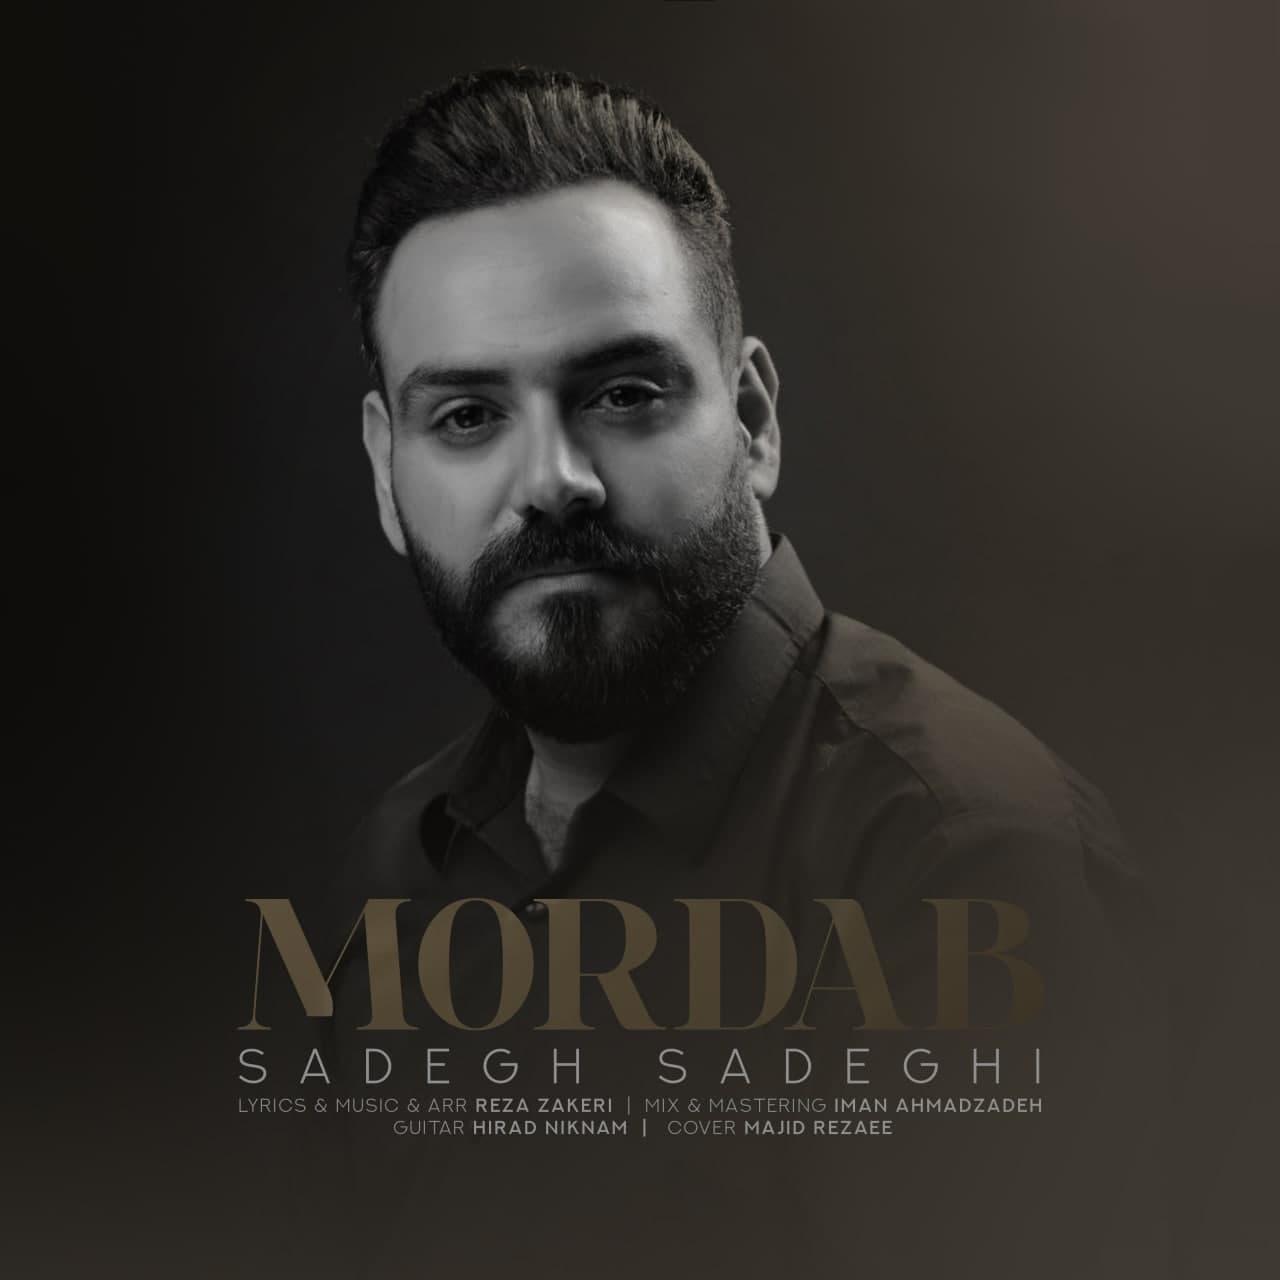 Download Ahang صادق صادقی مرداب